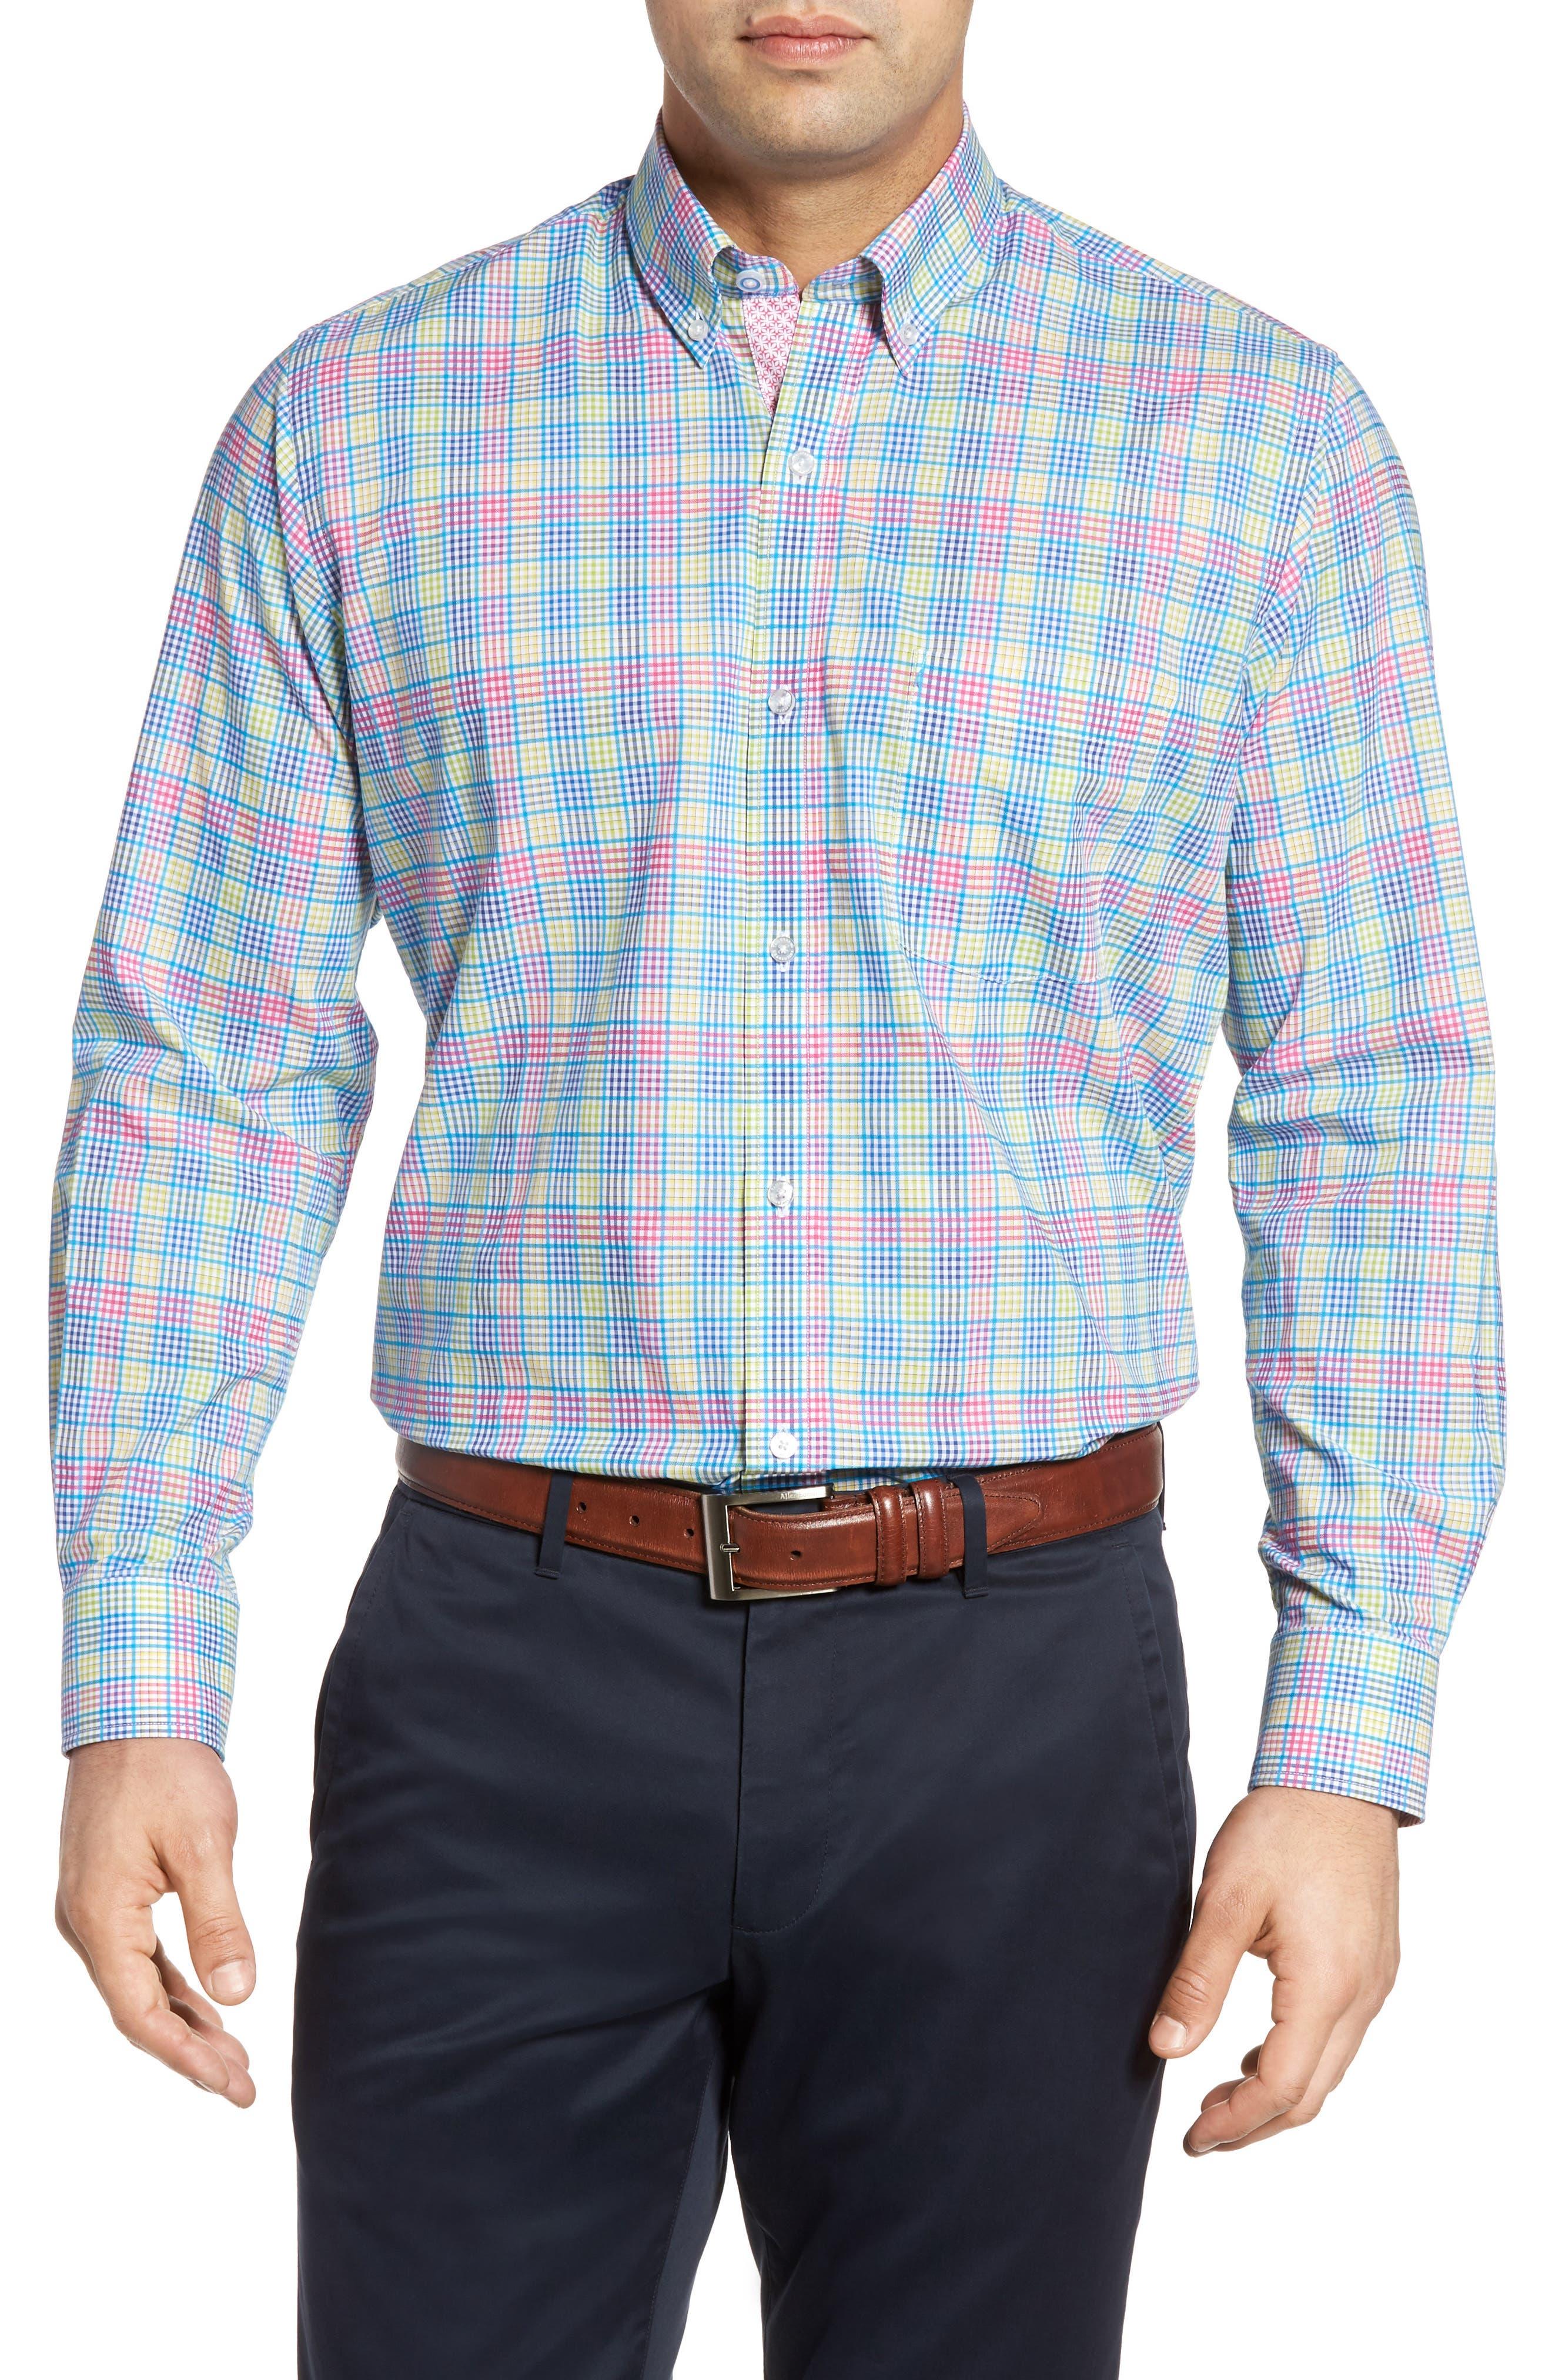 TailorByrd Peachleaf Sport Shirt (Big & Tall)